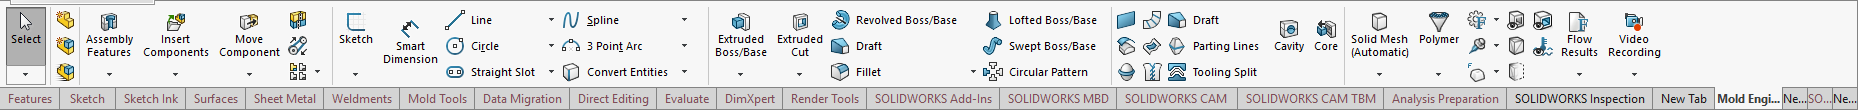 Custom CommandManager tabs